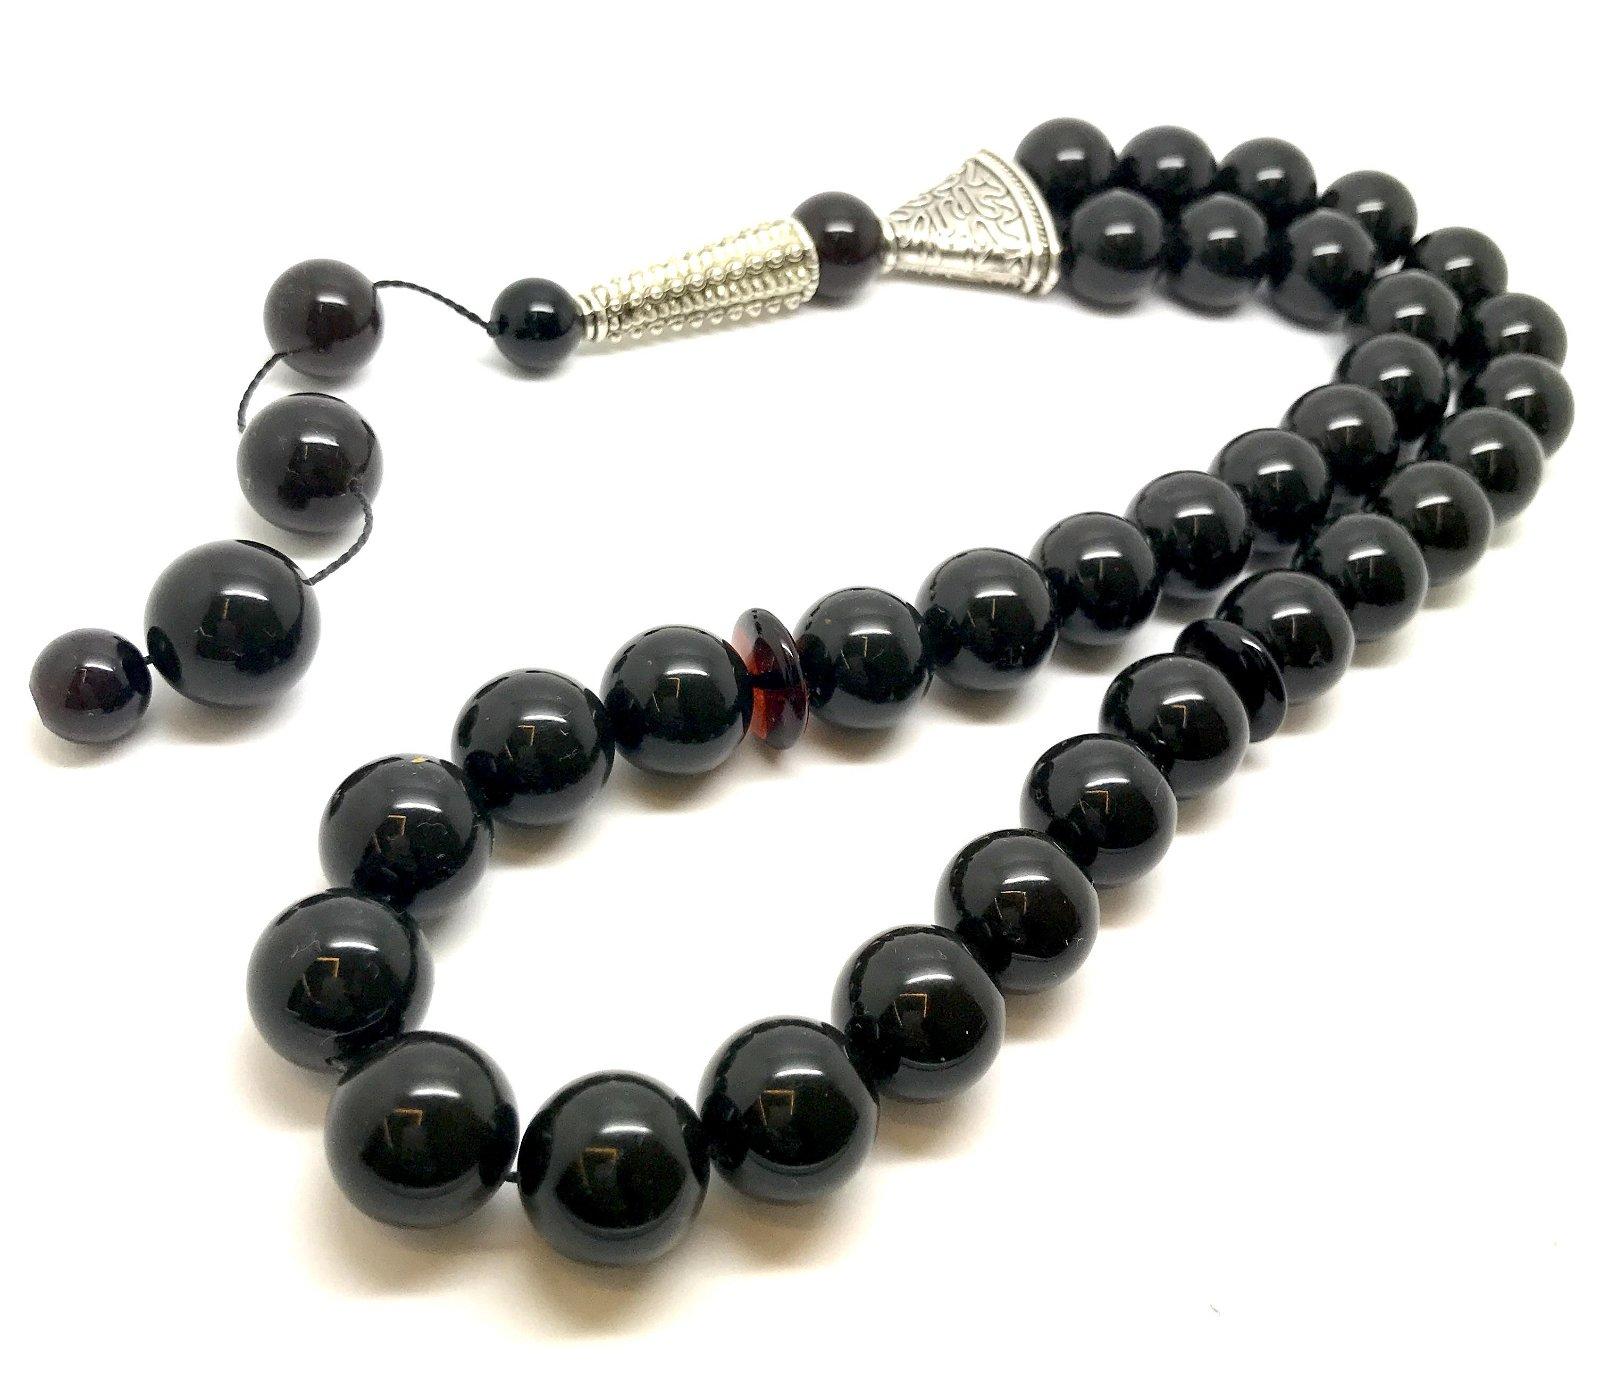 Baltic amber musbaha tesbih Islam rosary 33 beads 71 gr